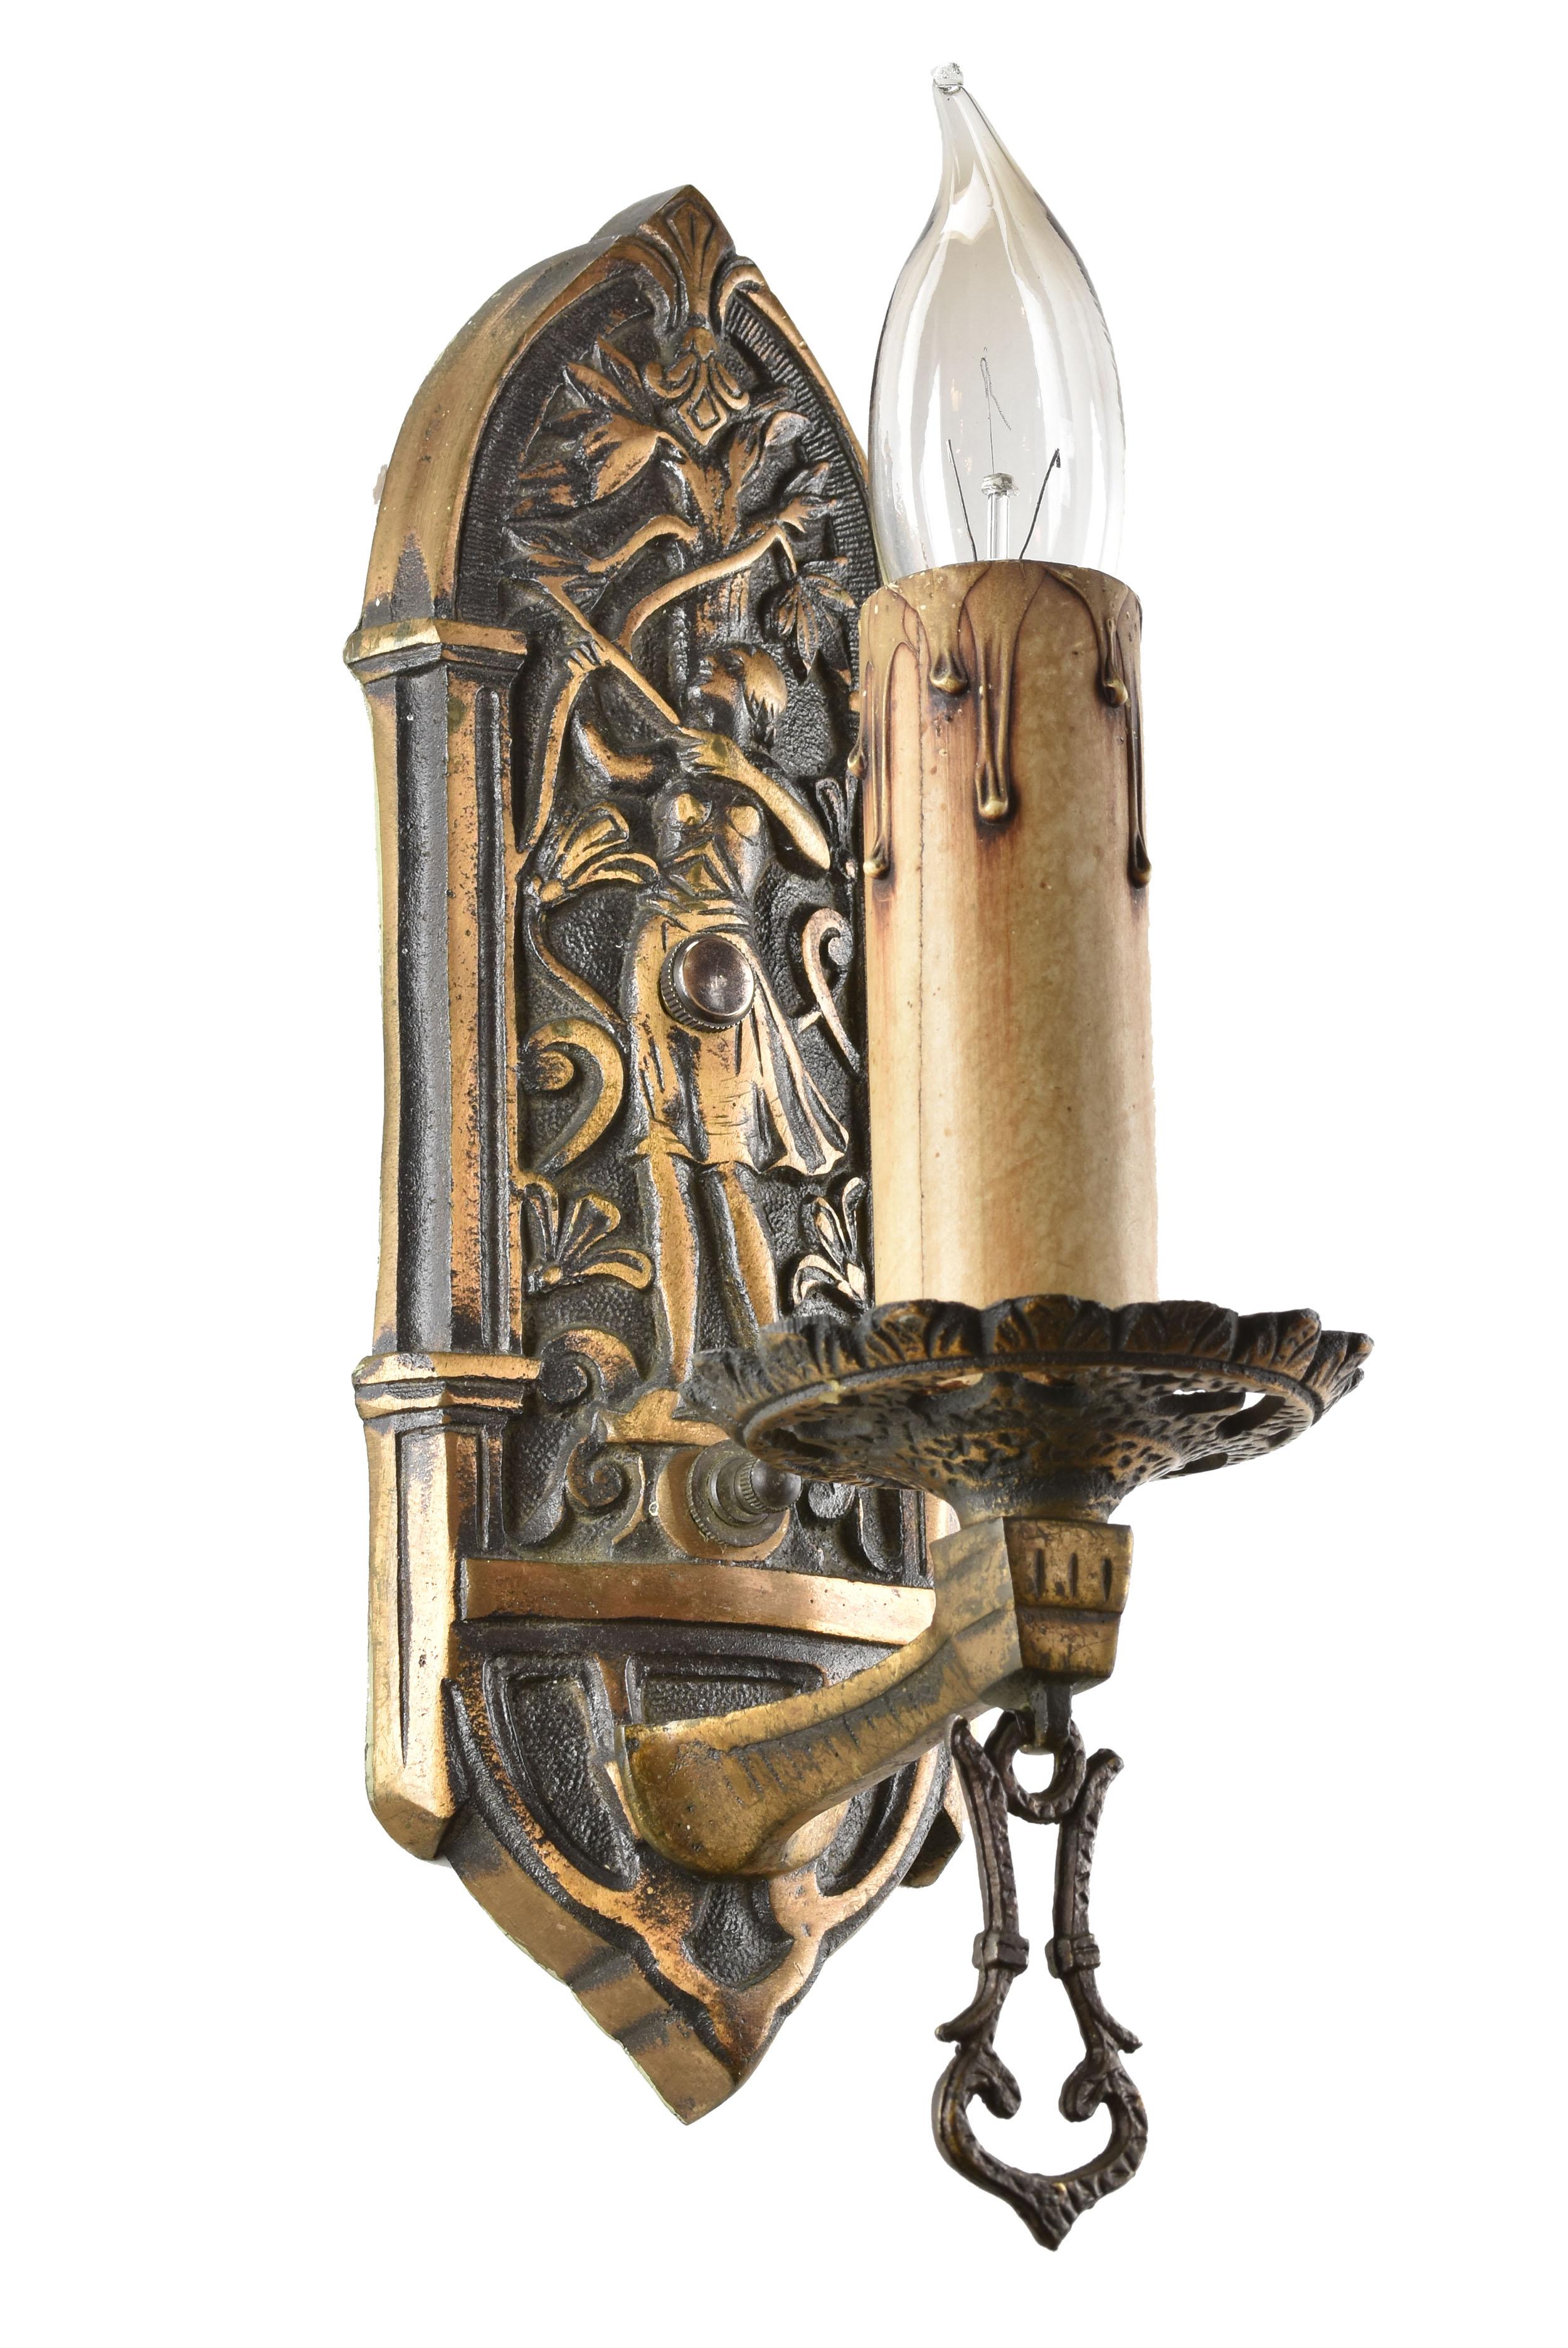 48426 single candle bronze archer sconce left.jpg